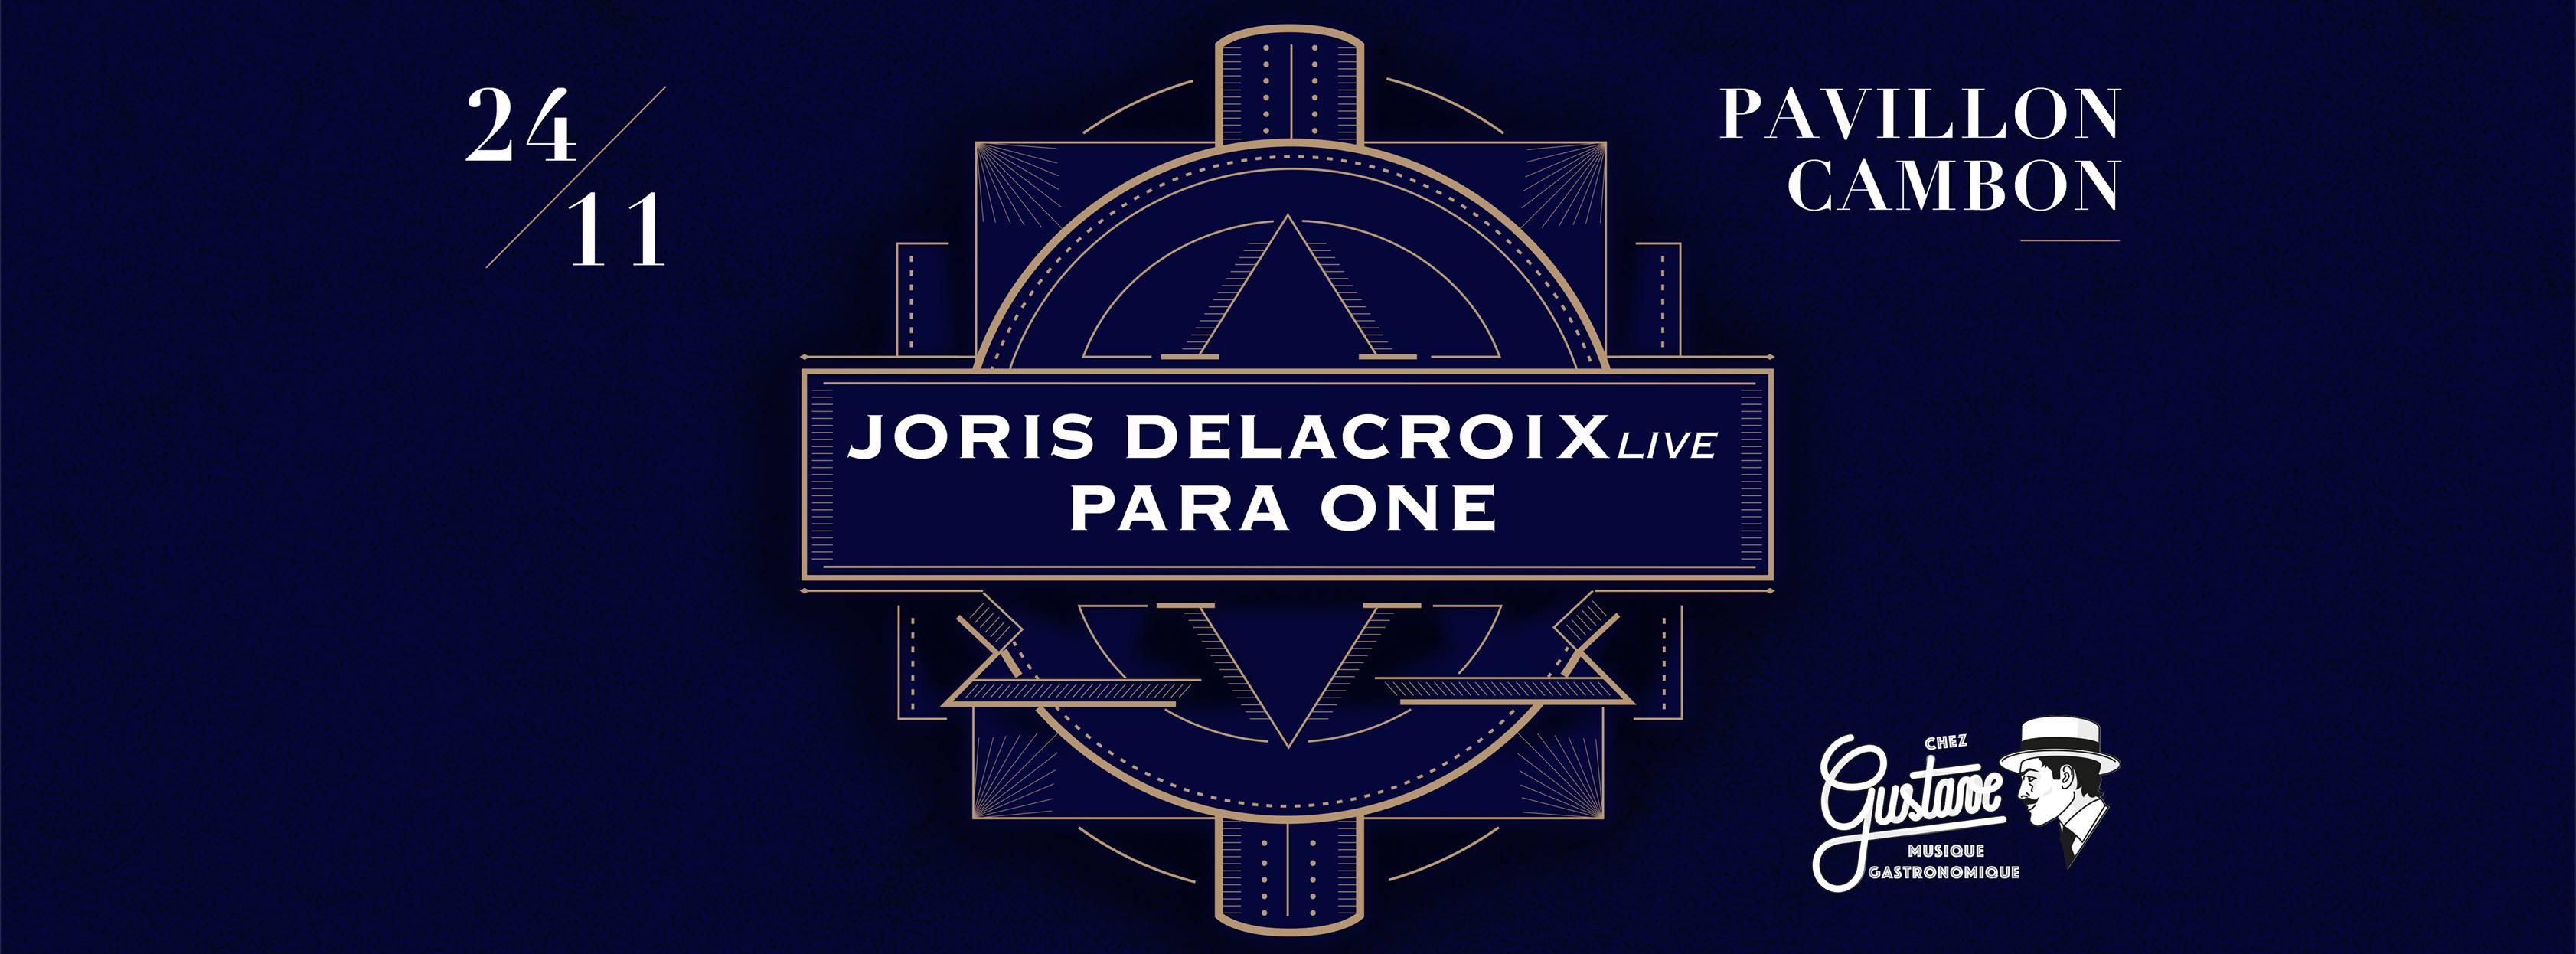 Chez Gustave invite Joris Delacroix (live) & Para One